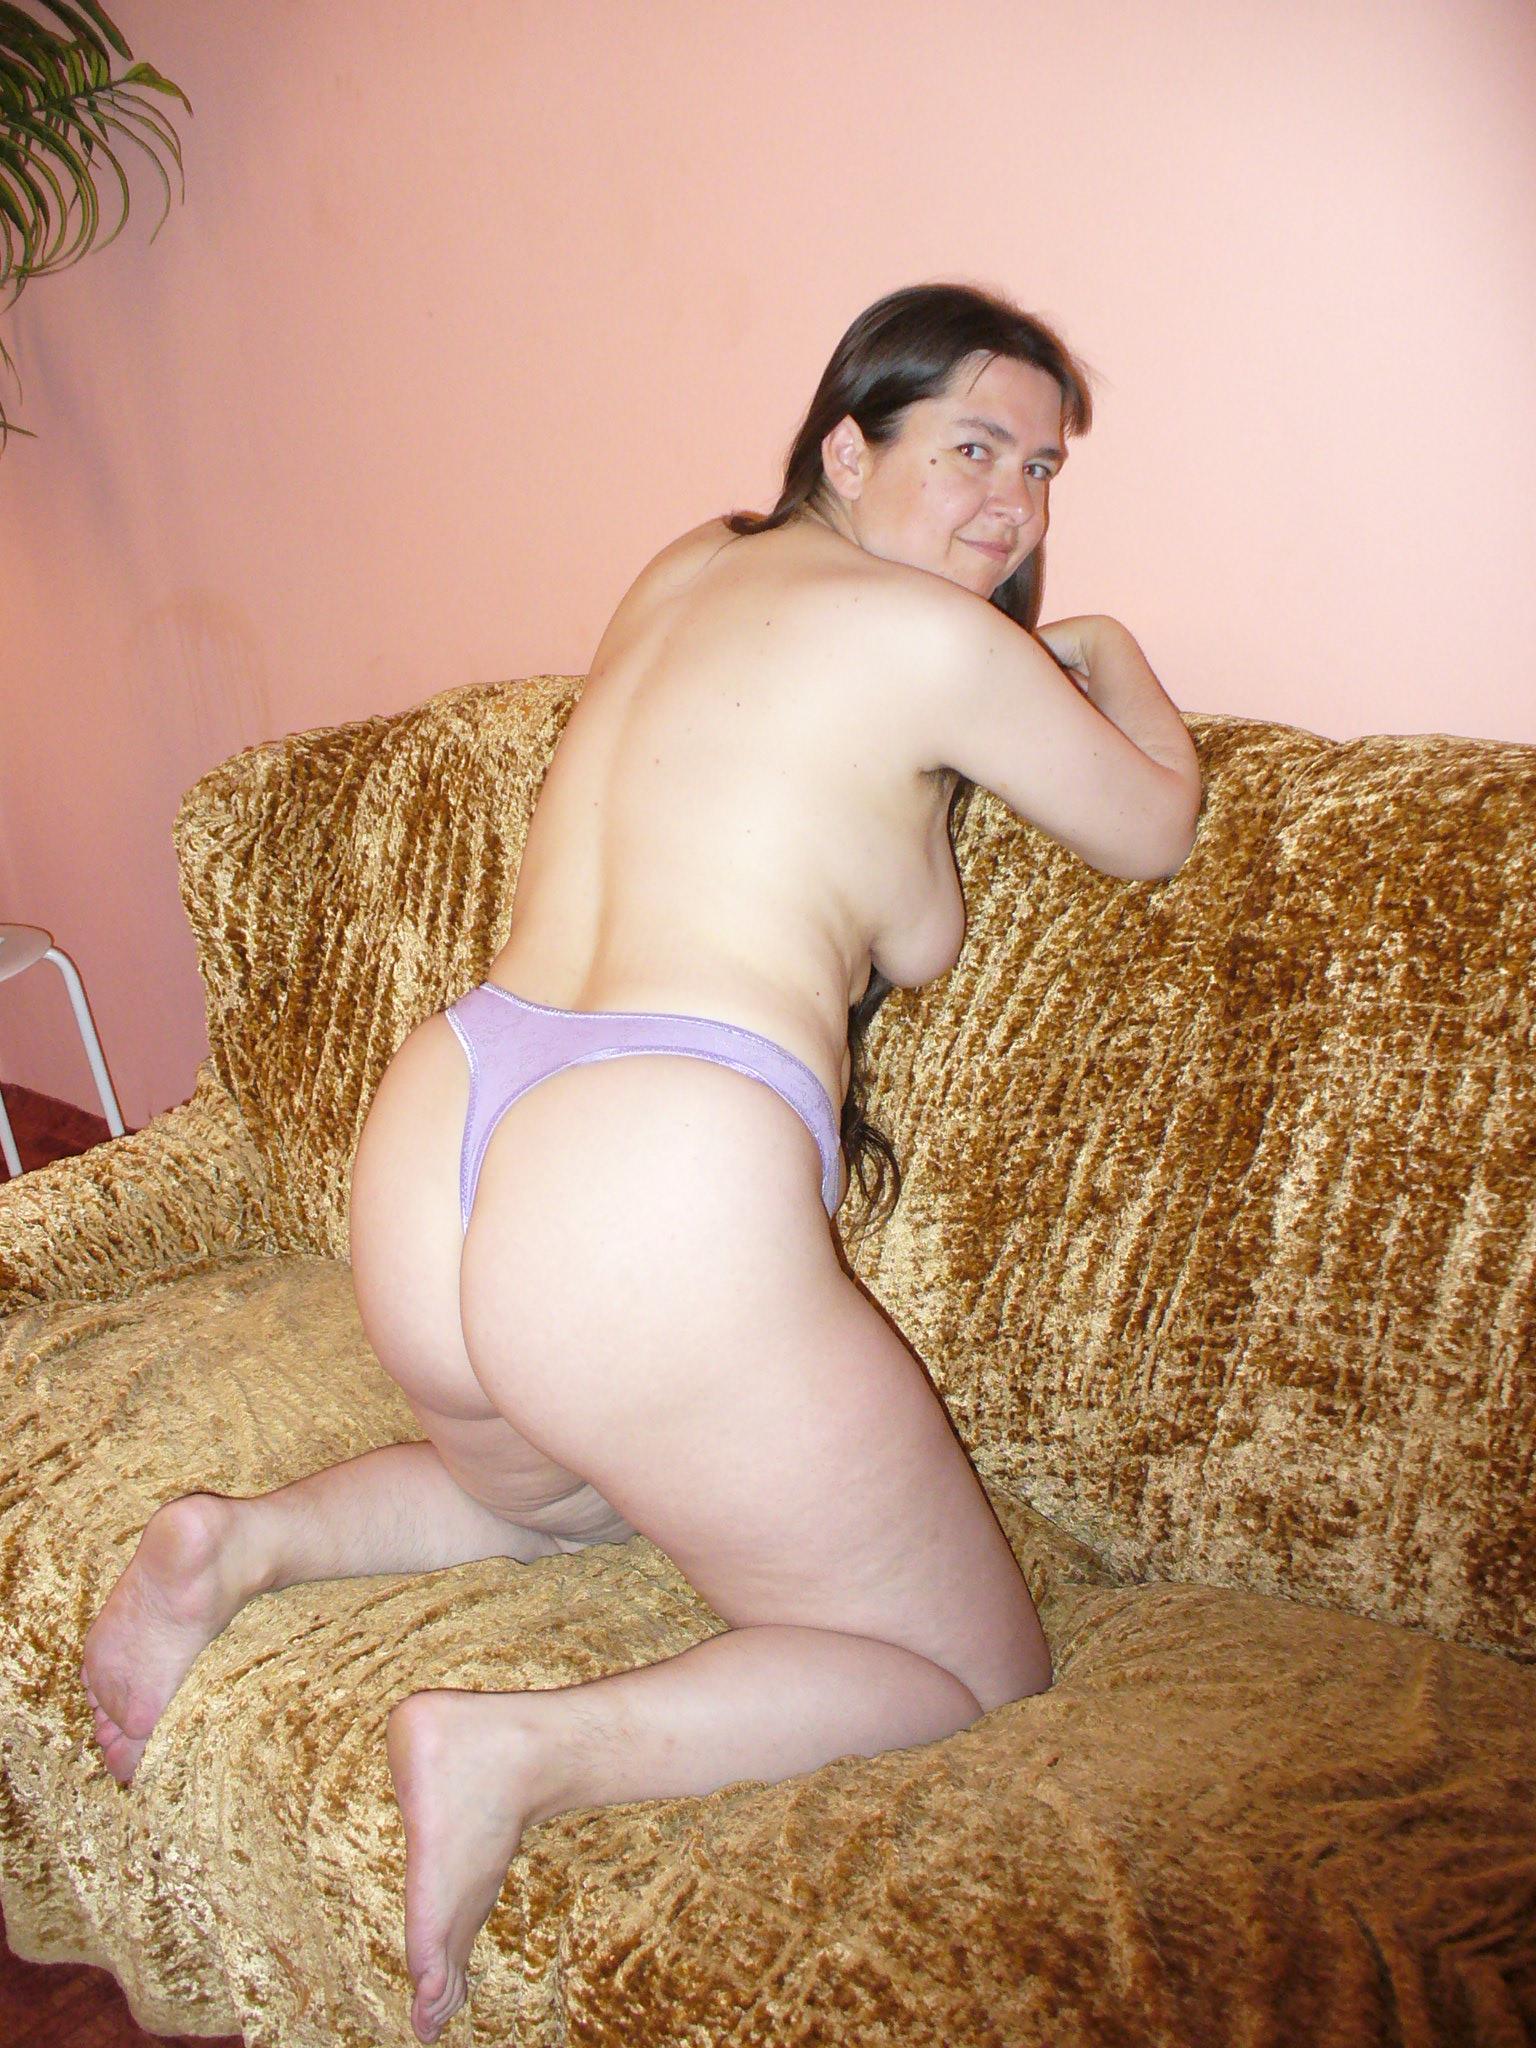 sex chat norge intim massasje stavanger